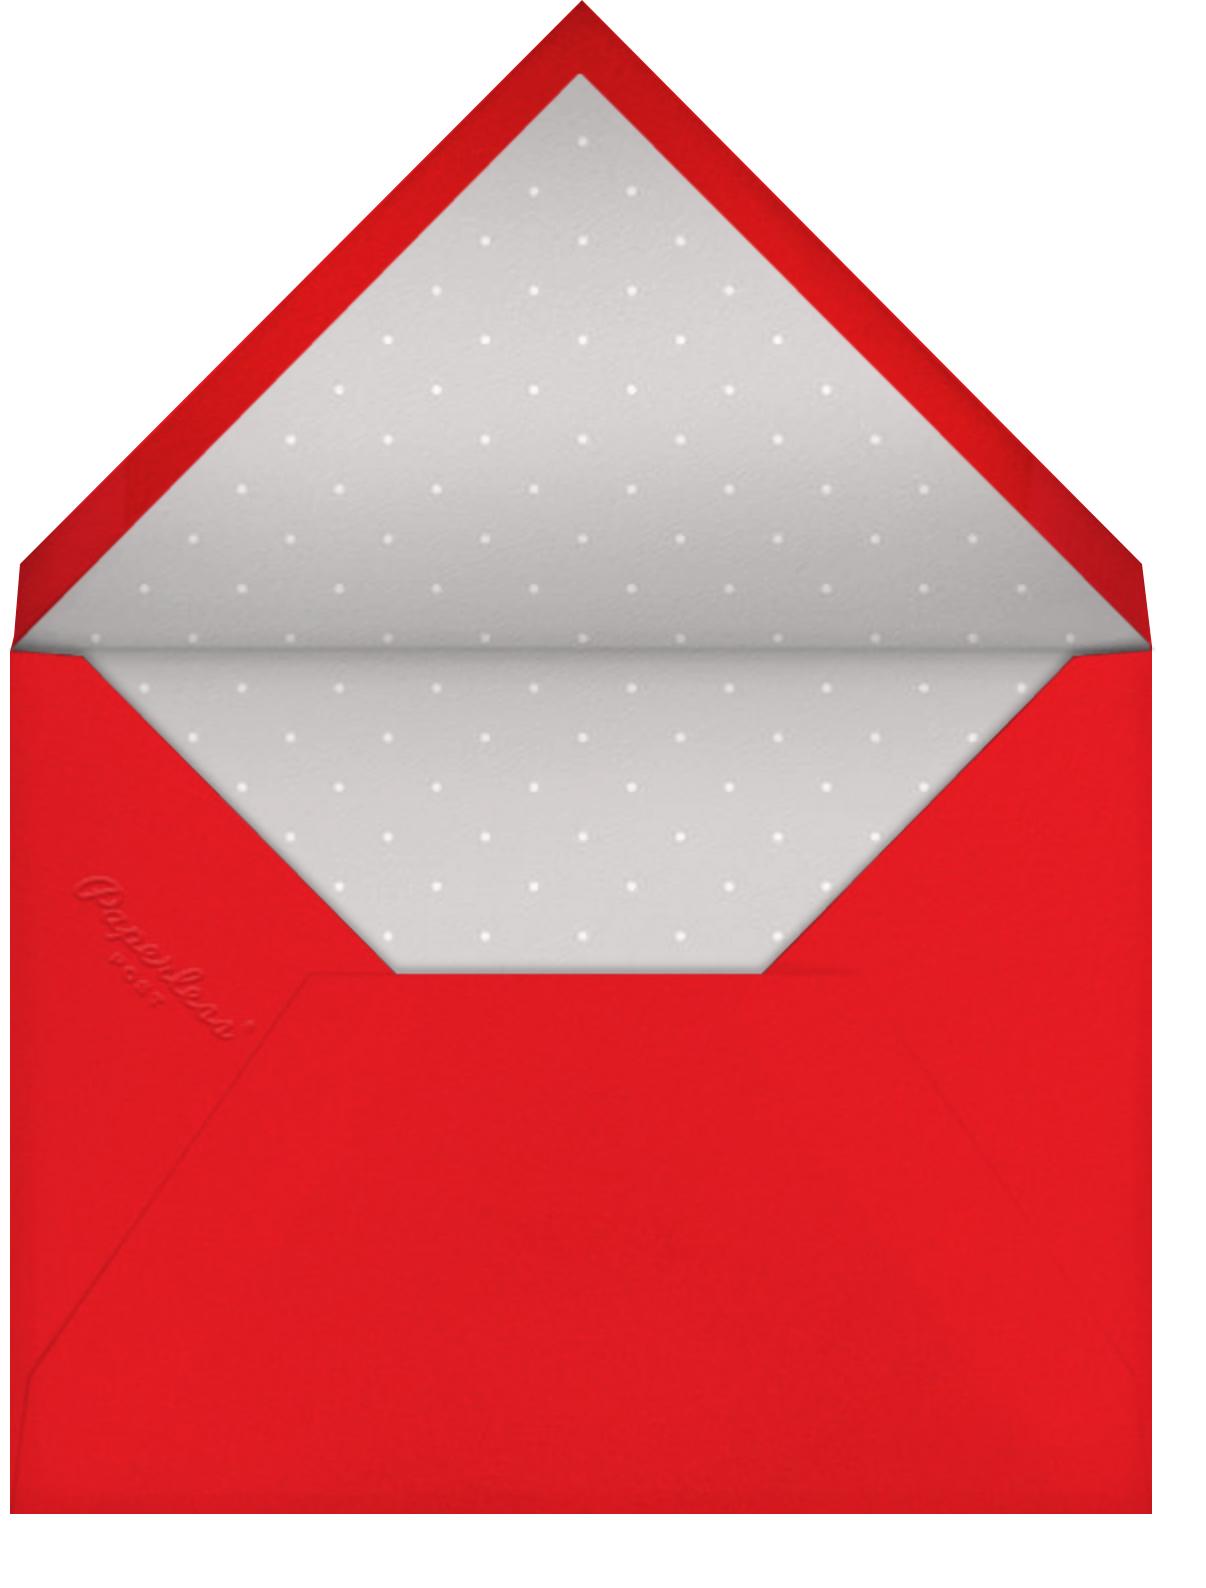 Burst Forth - Blue - Paperless Post - 4th of July - envelope back